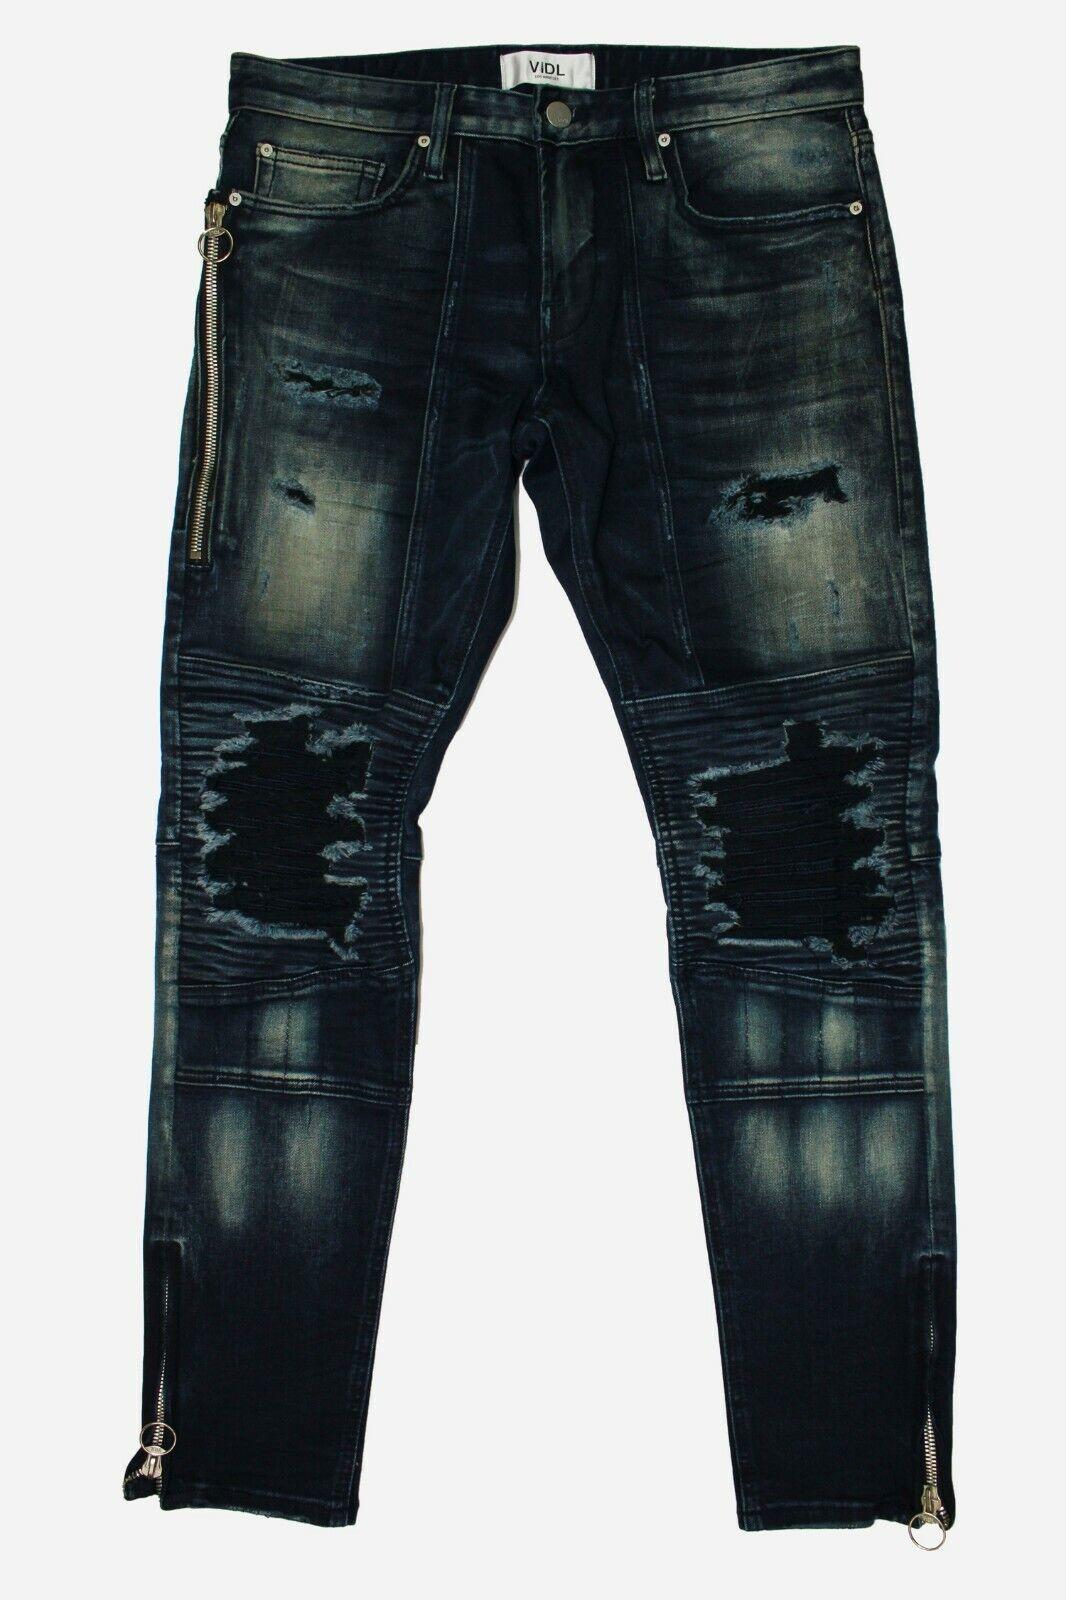 Mens VIDL Los Angeles Naval Chopper Premium Denim Jeans